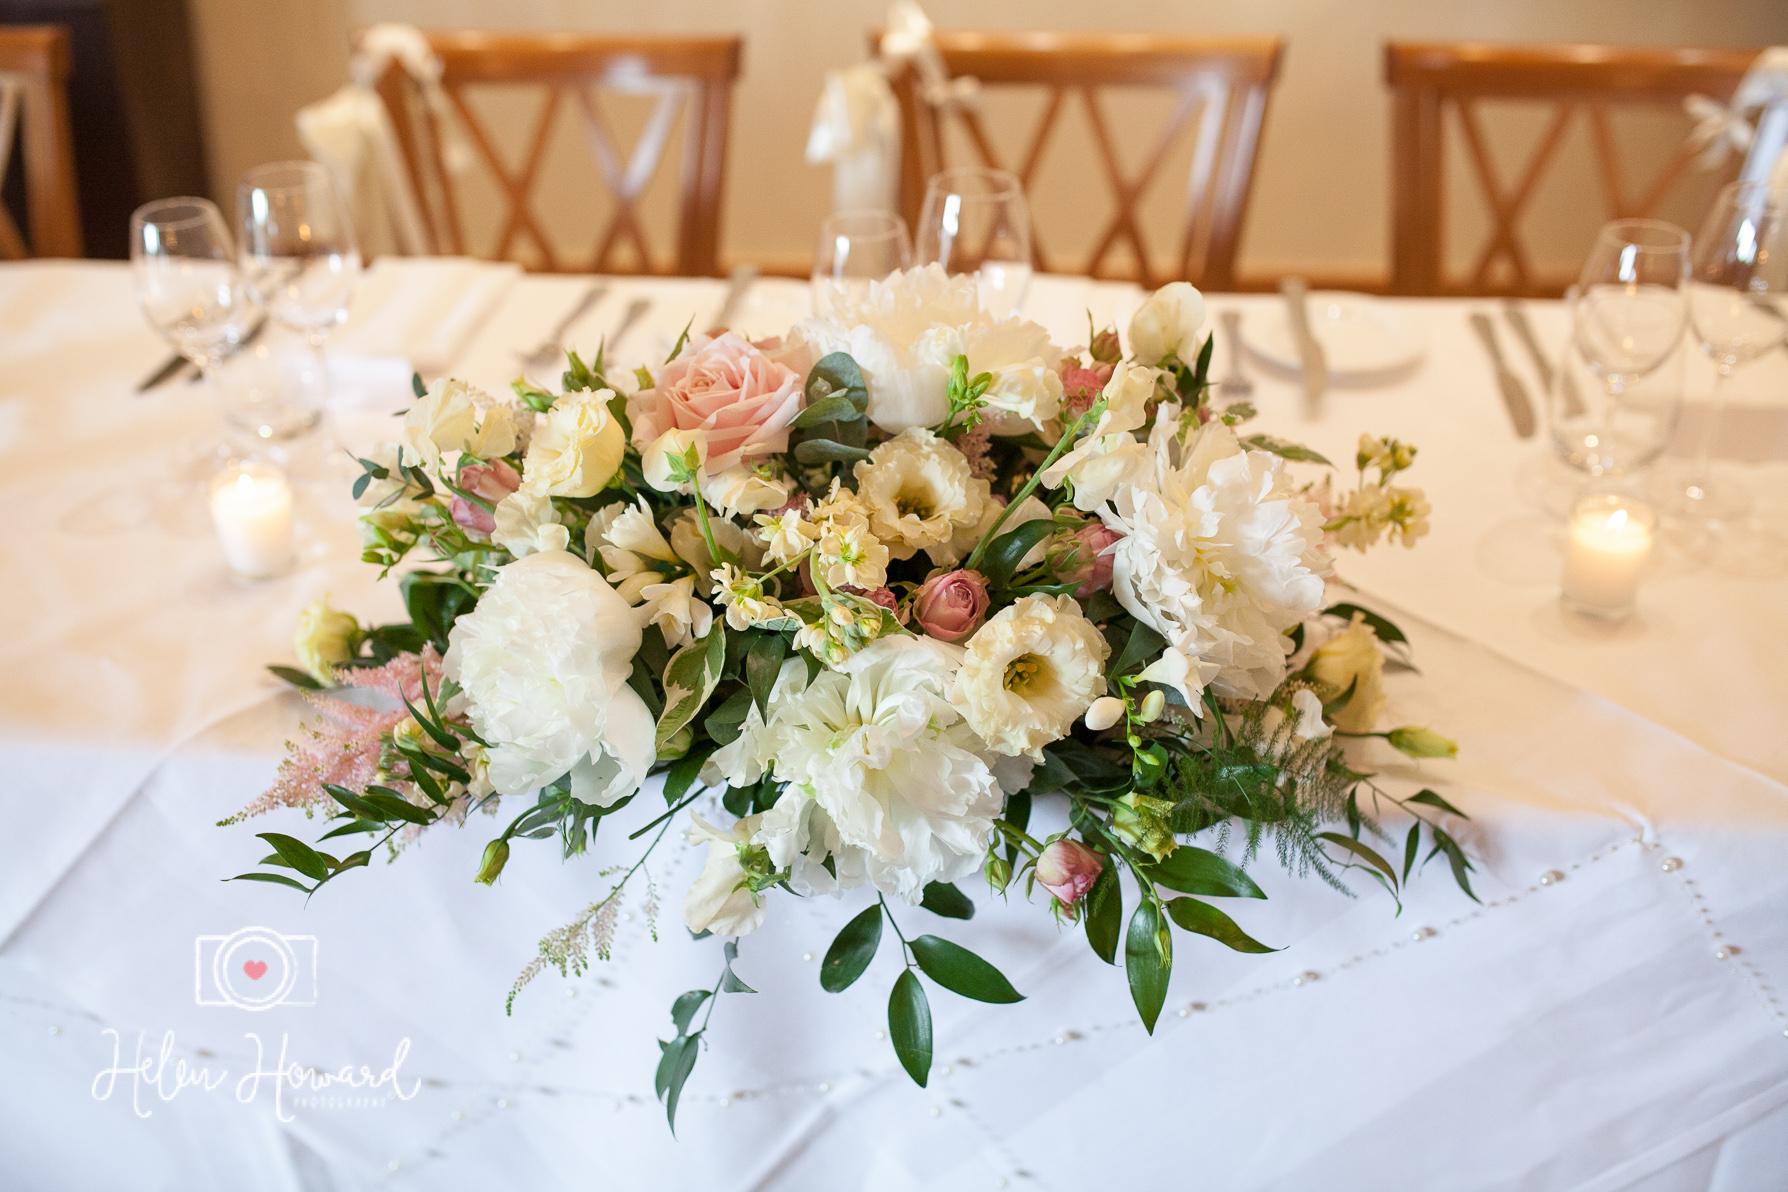 Helen Howard Photography Packington Moor Wedding-86.jpg